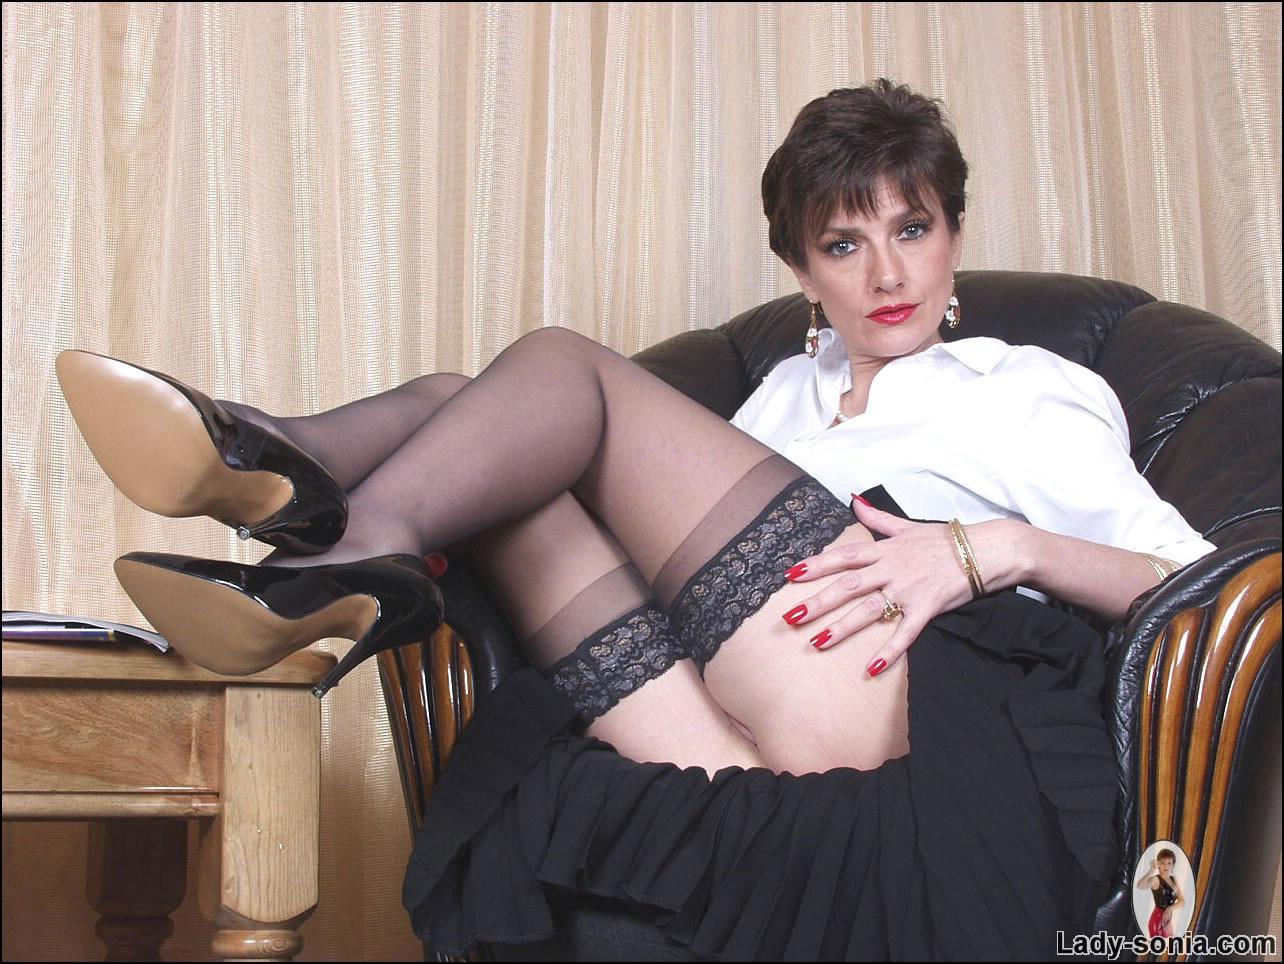 Free crotch underclothes milf lady sonia